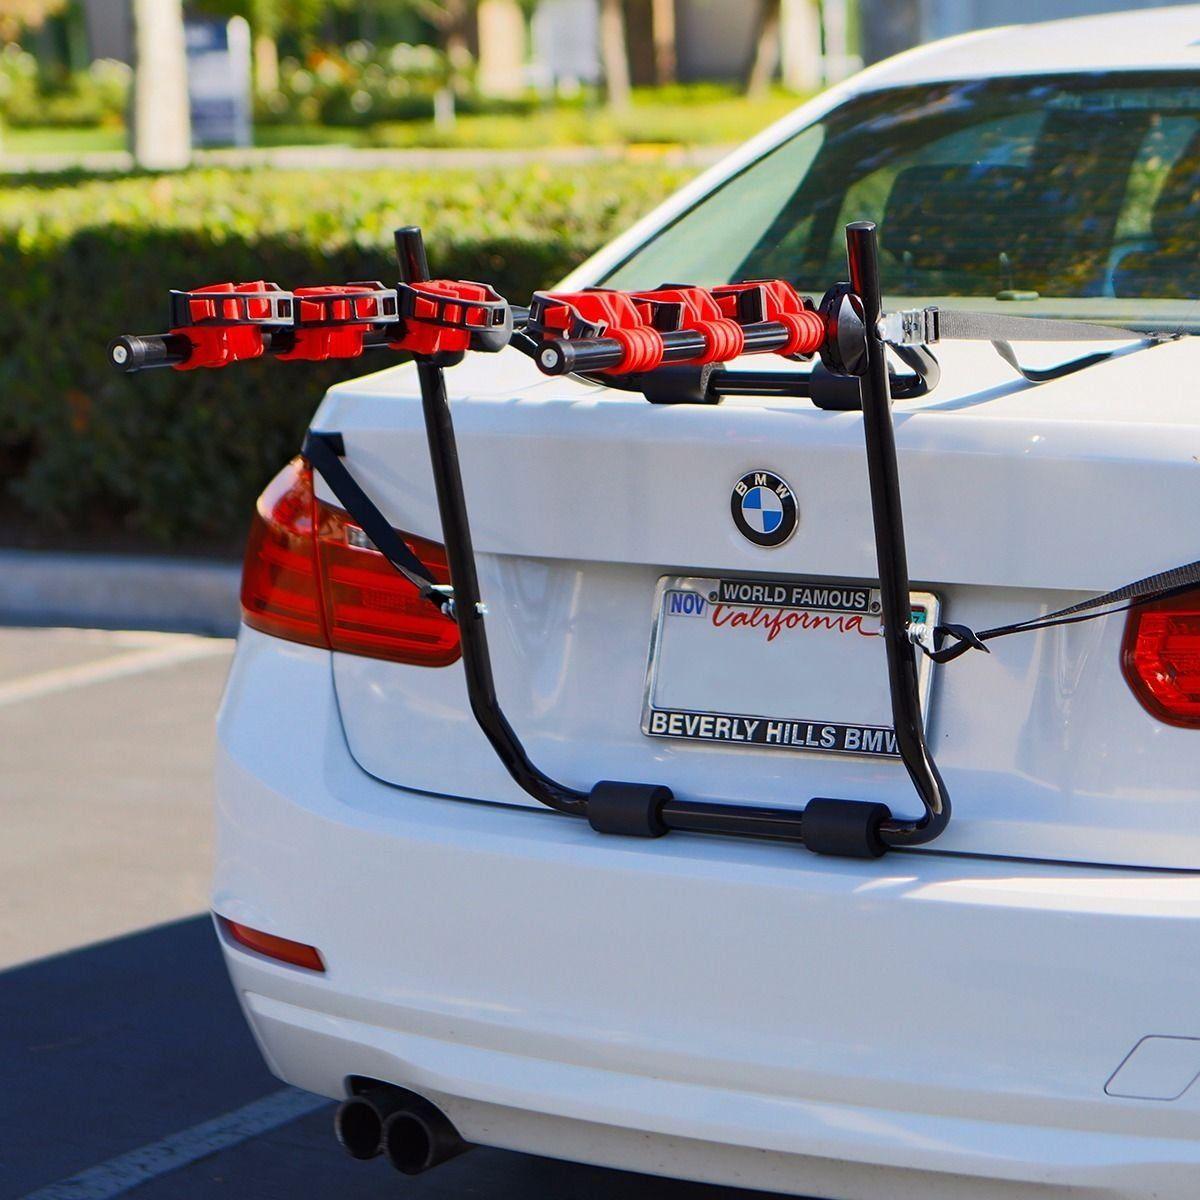 New 3 Bike TrunkMount Hatchback SUV or Car Sport Bicycle